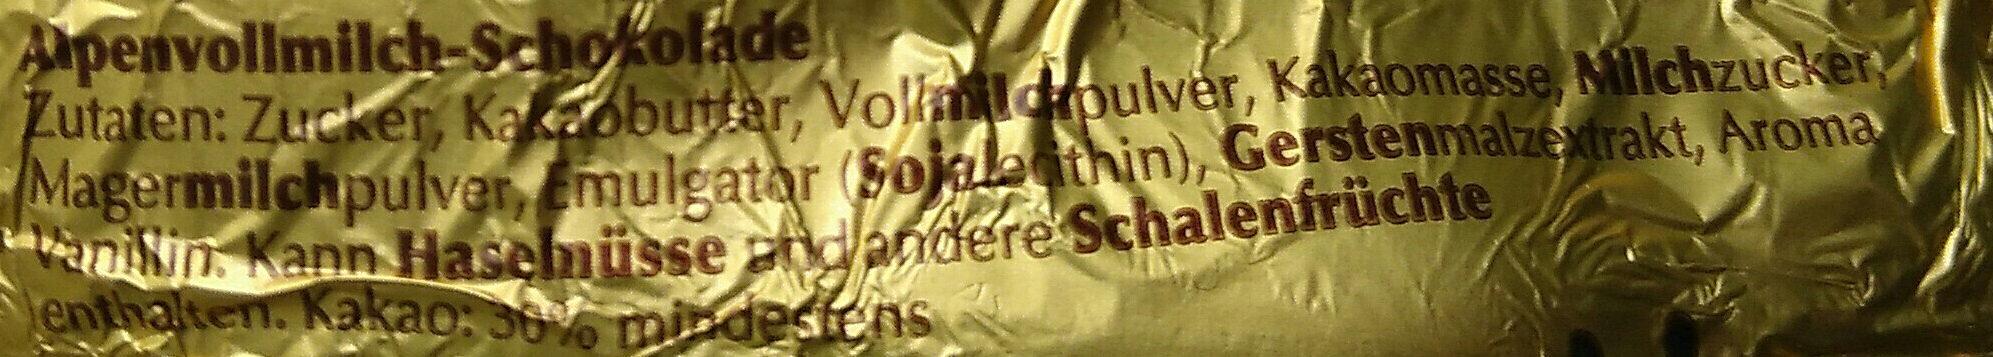 Goldhase - Ingredients - de